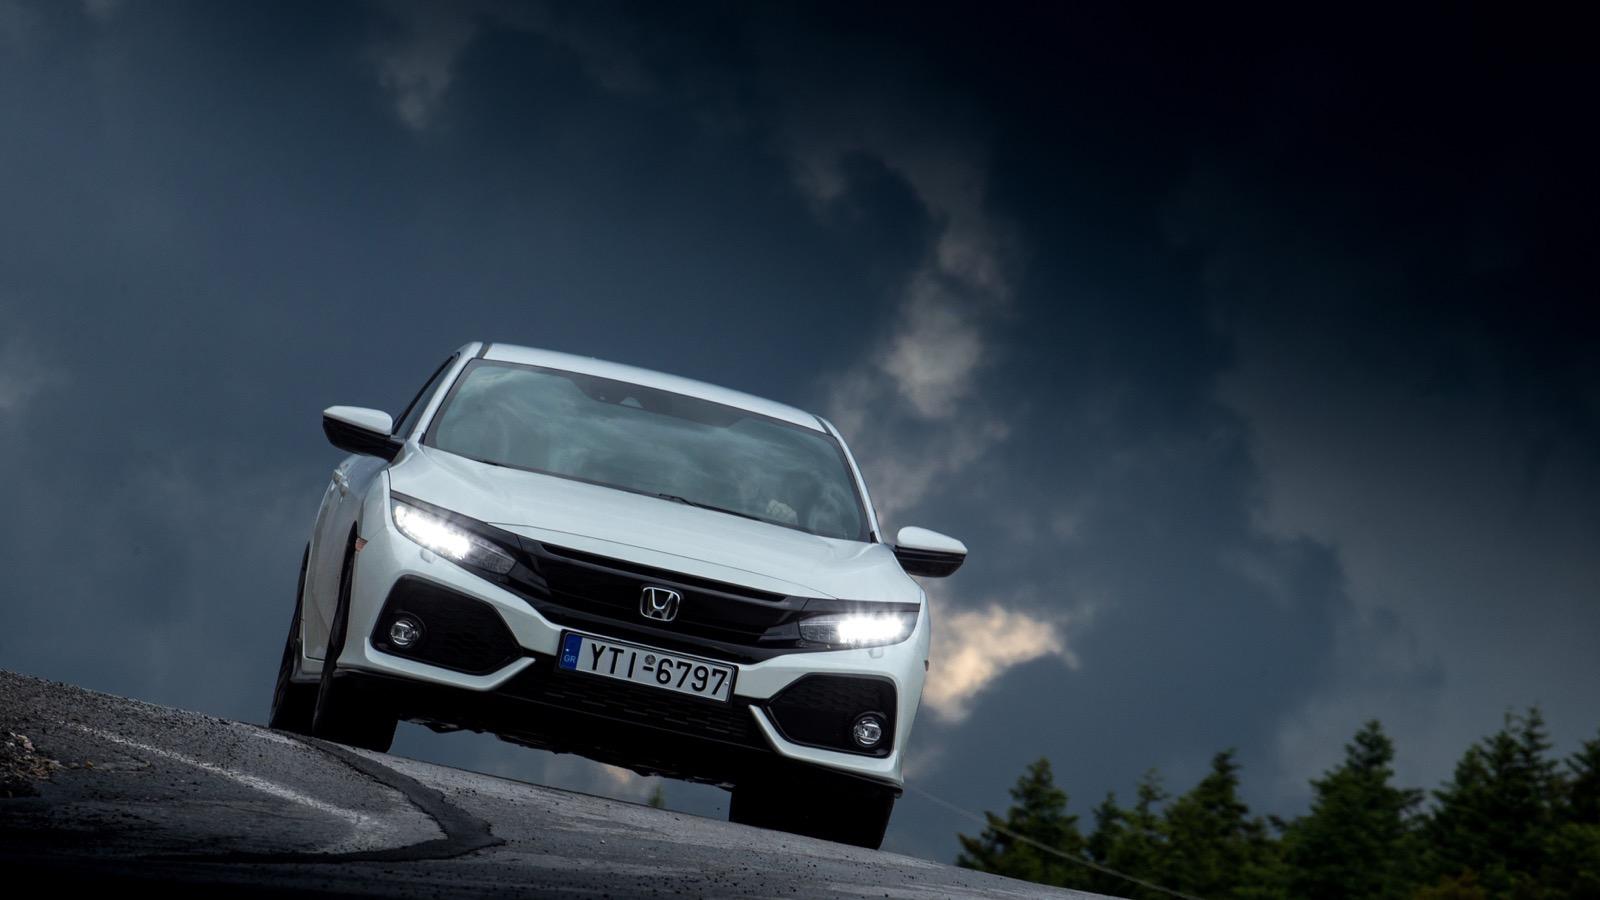 New_Honda_Civic_First_Drive_146